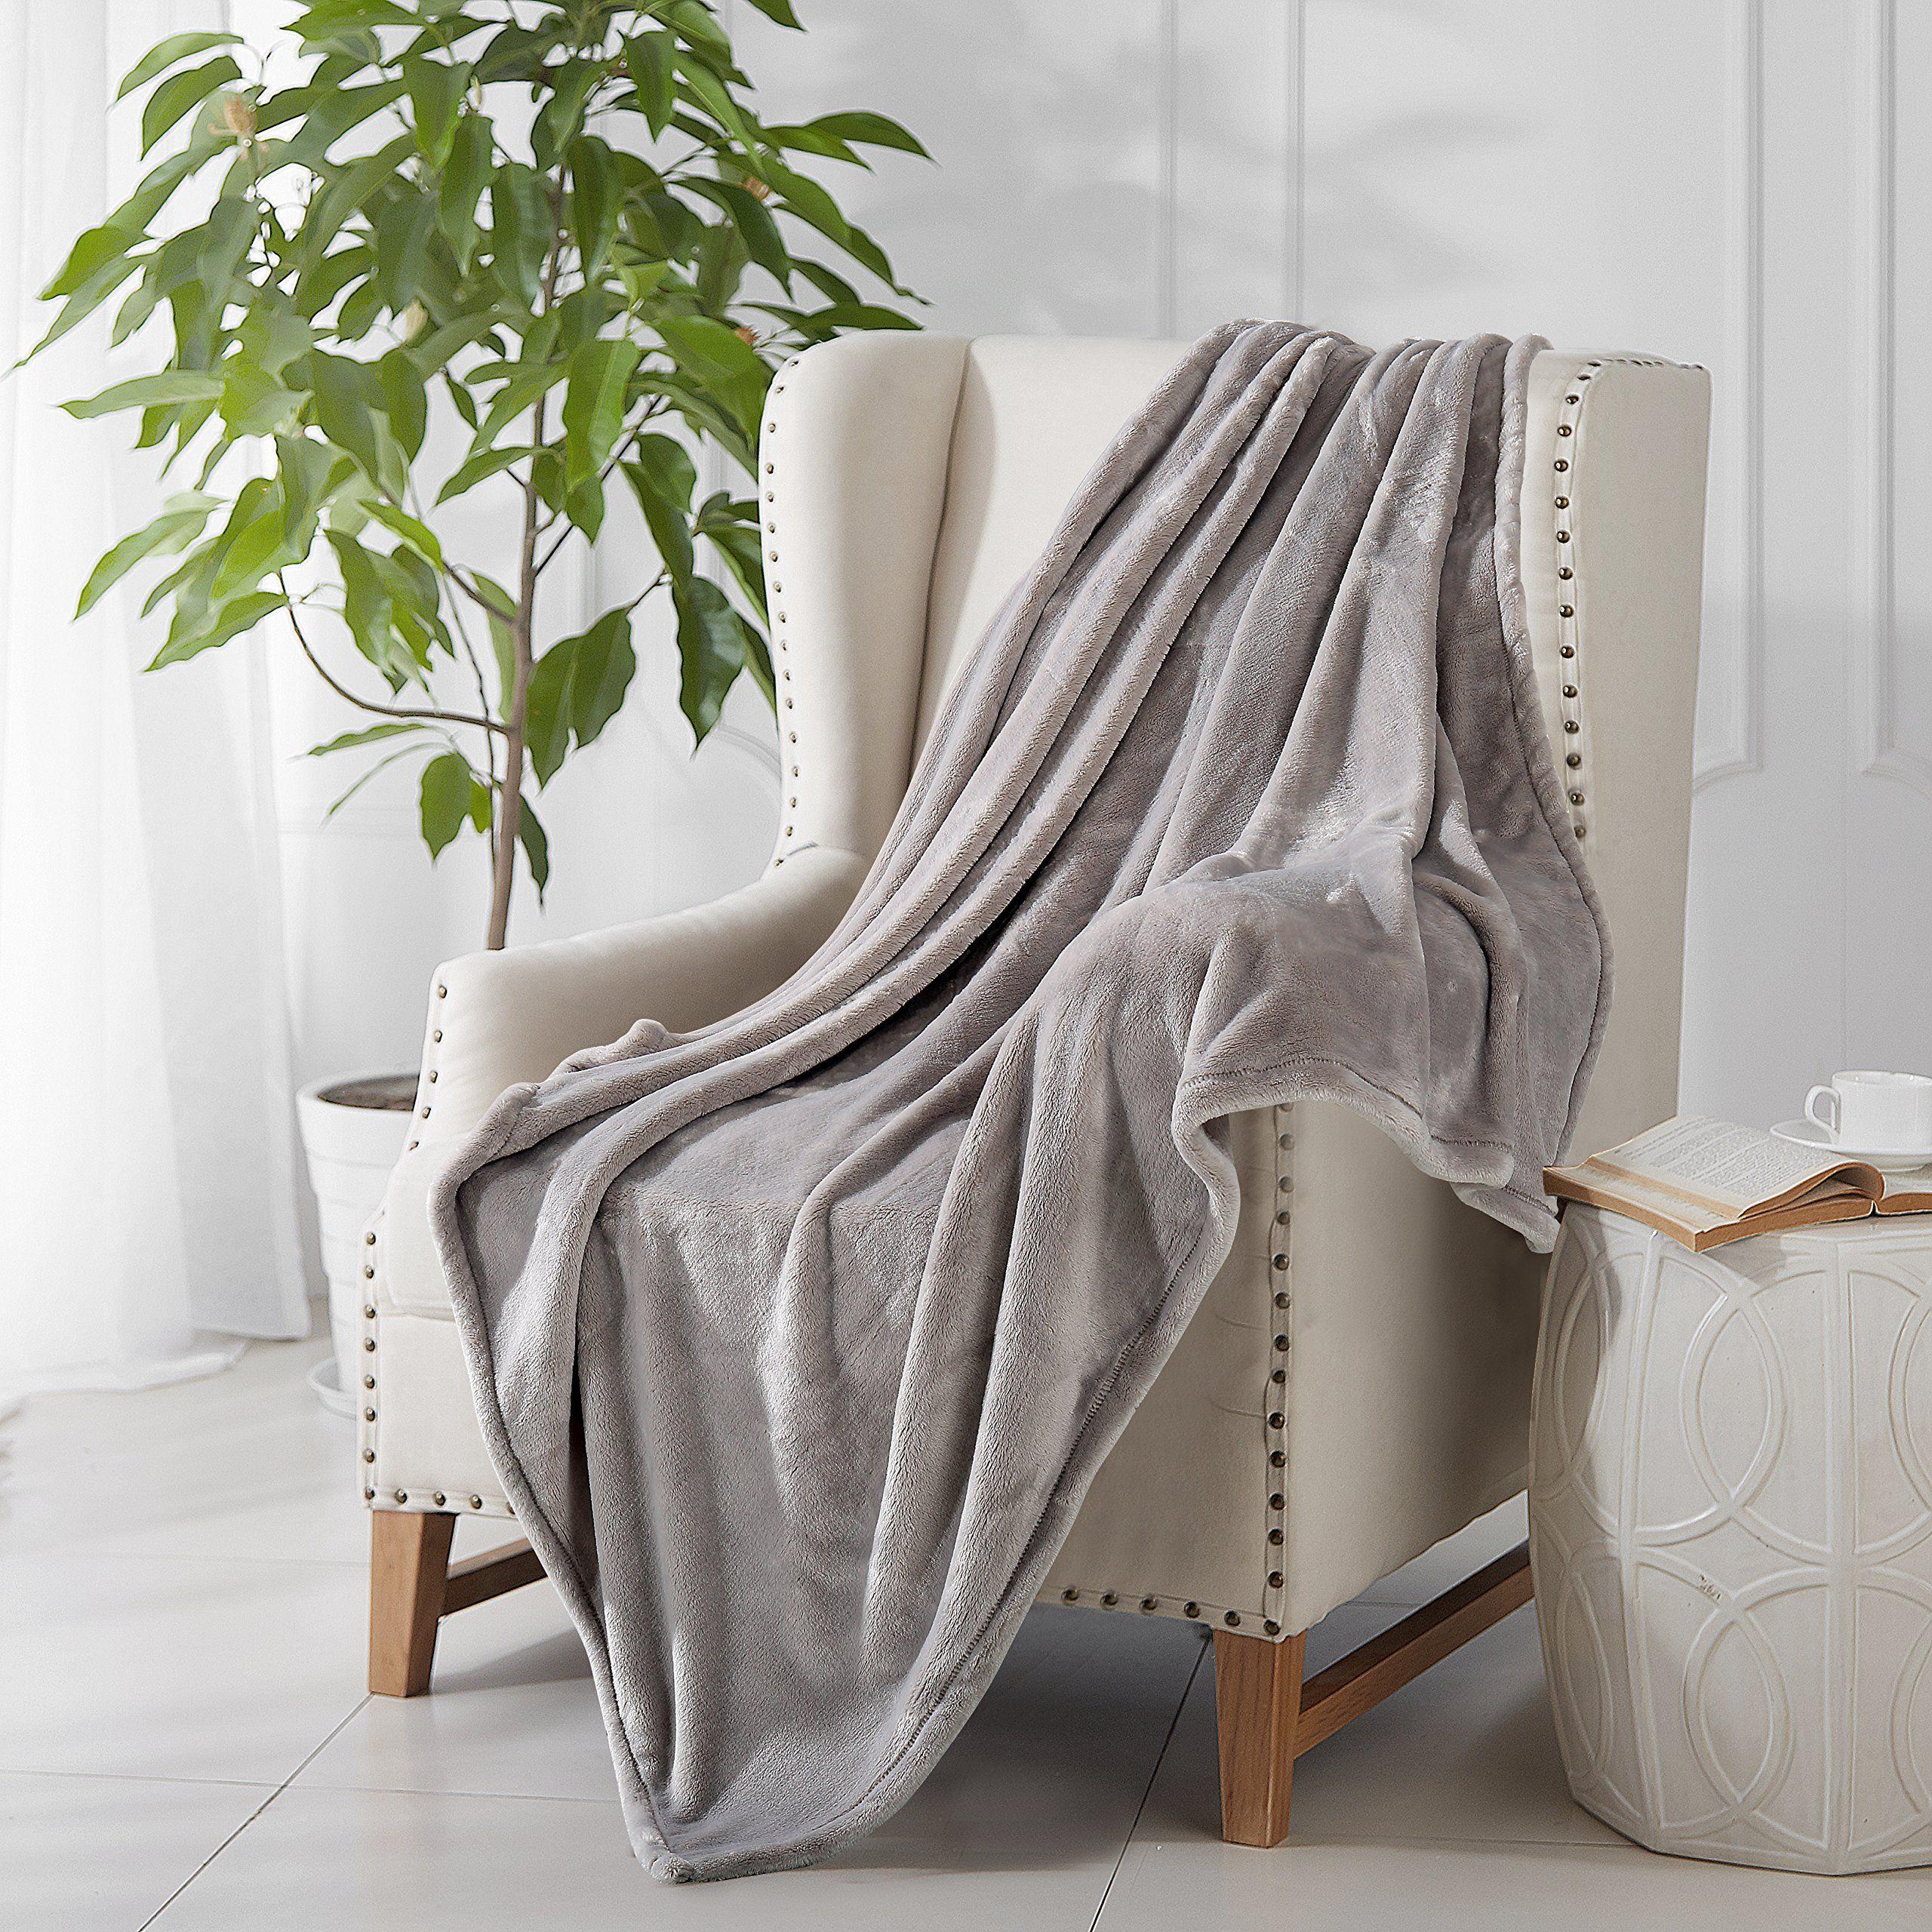 Flannel fleece blanket  Reafort Ultra Soft Flannel Fleece All Season GSM Light Weight